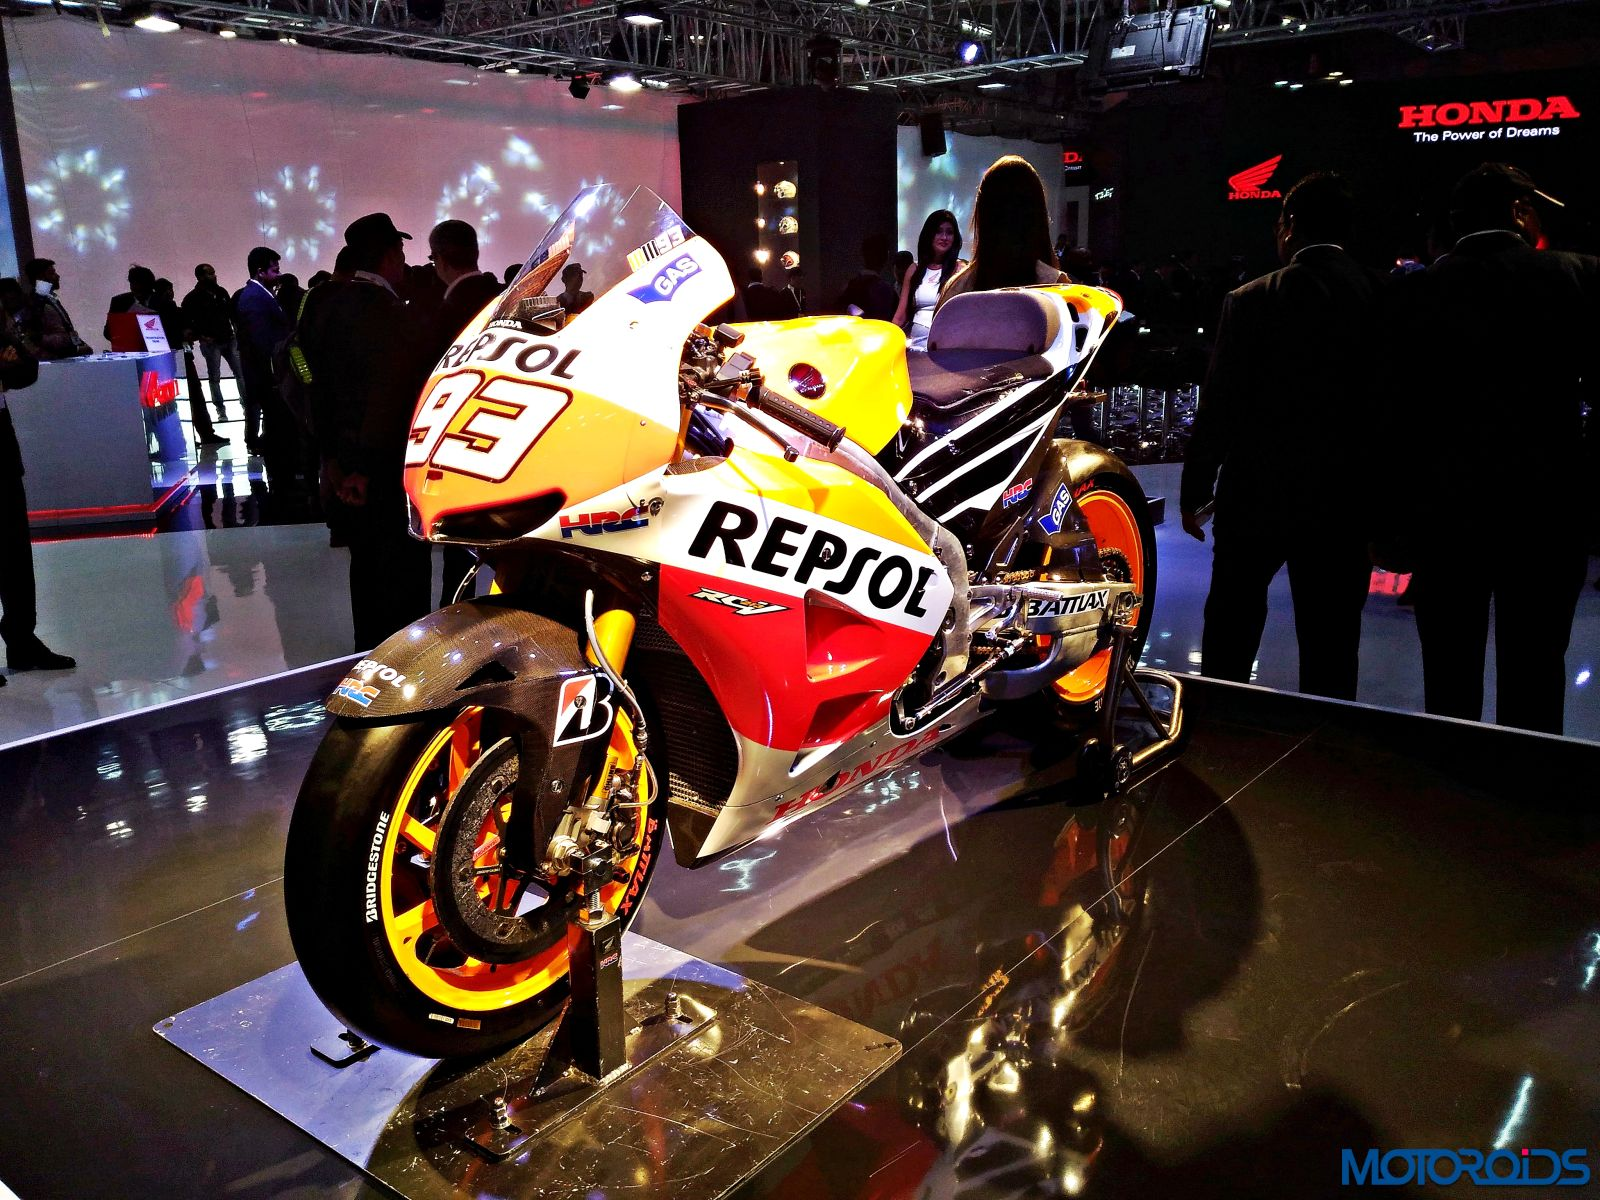 Honda RC213V - MotoGP Motorcycle - Auto Expo 2016 (4)